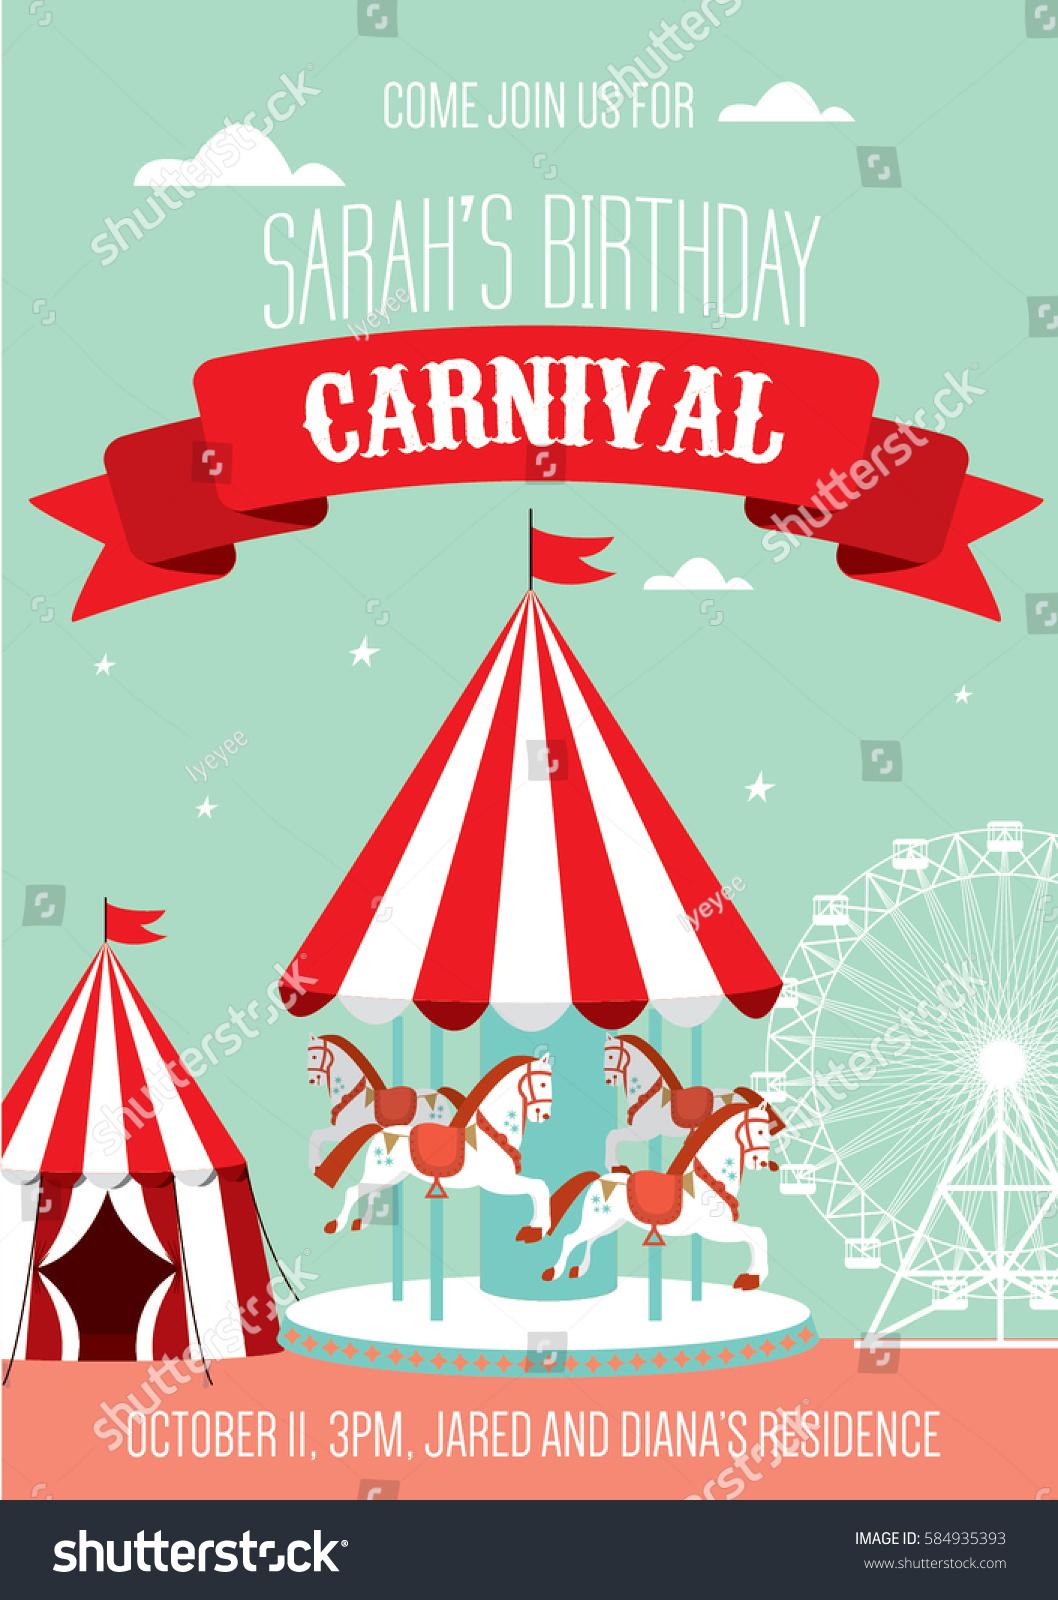 fun fair carnival birthday invitation template stock vector 584935393 shutterstock. Black Bedroom Furniture Sets. Home Design Ideas